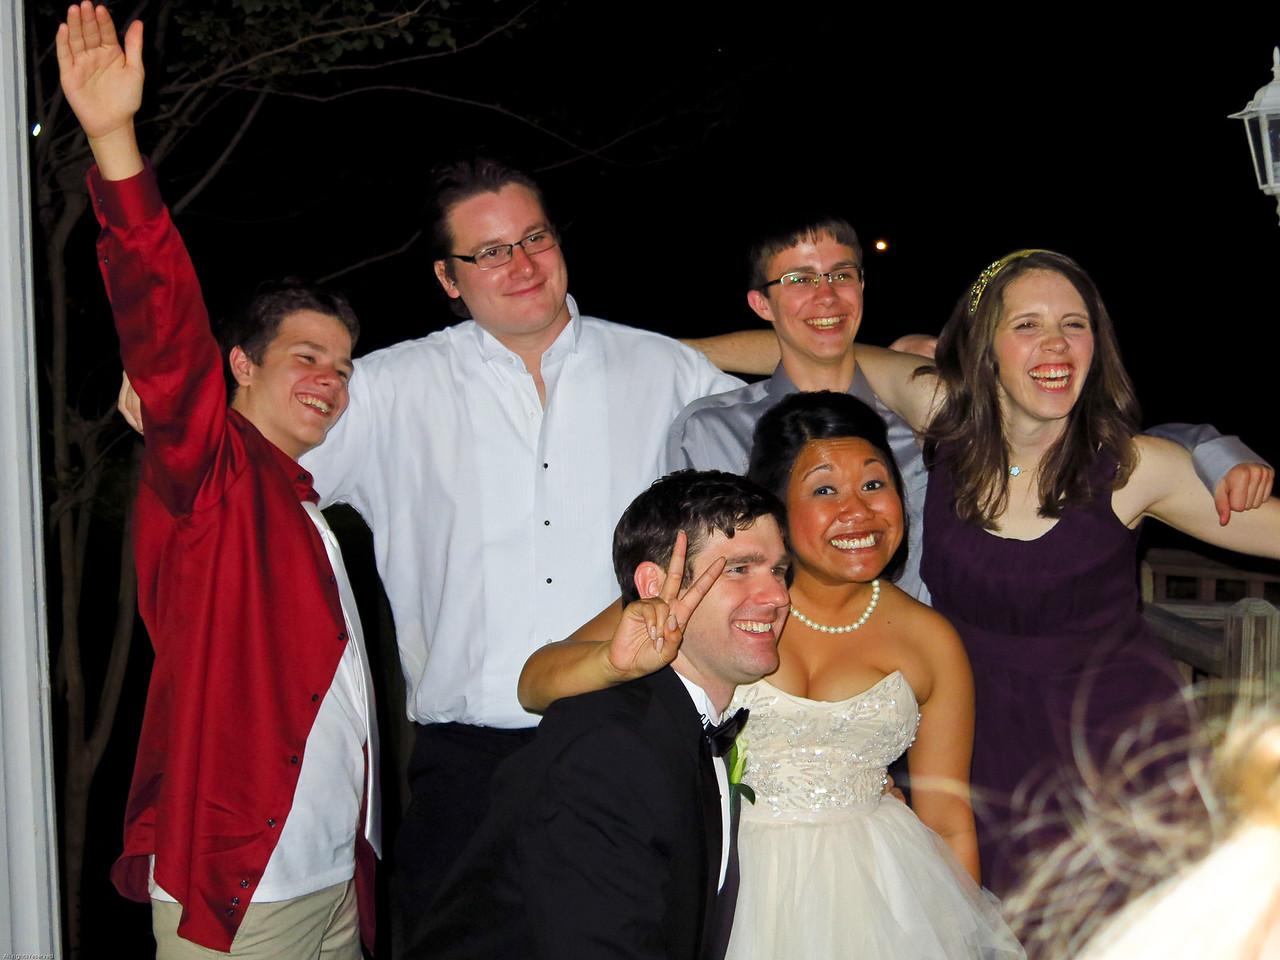 Gabe, Stuart, Garrison, Ann, Robert and Christy